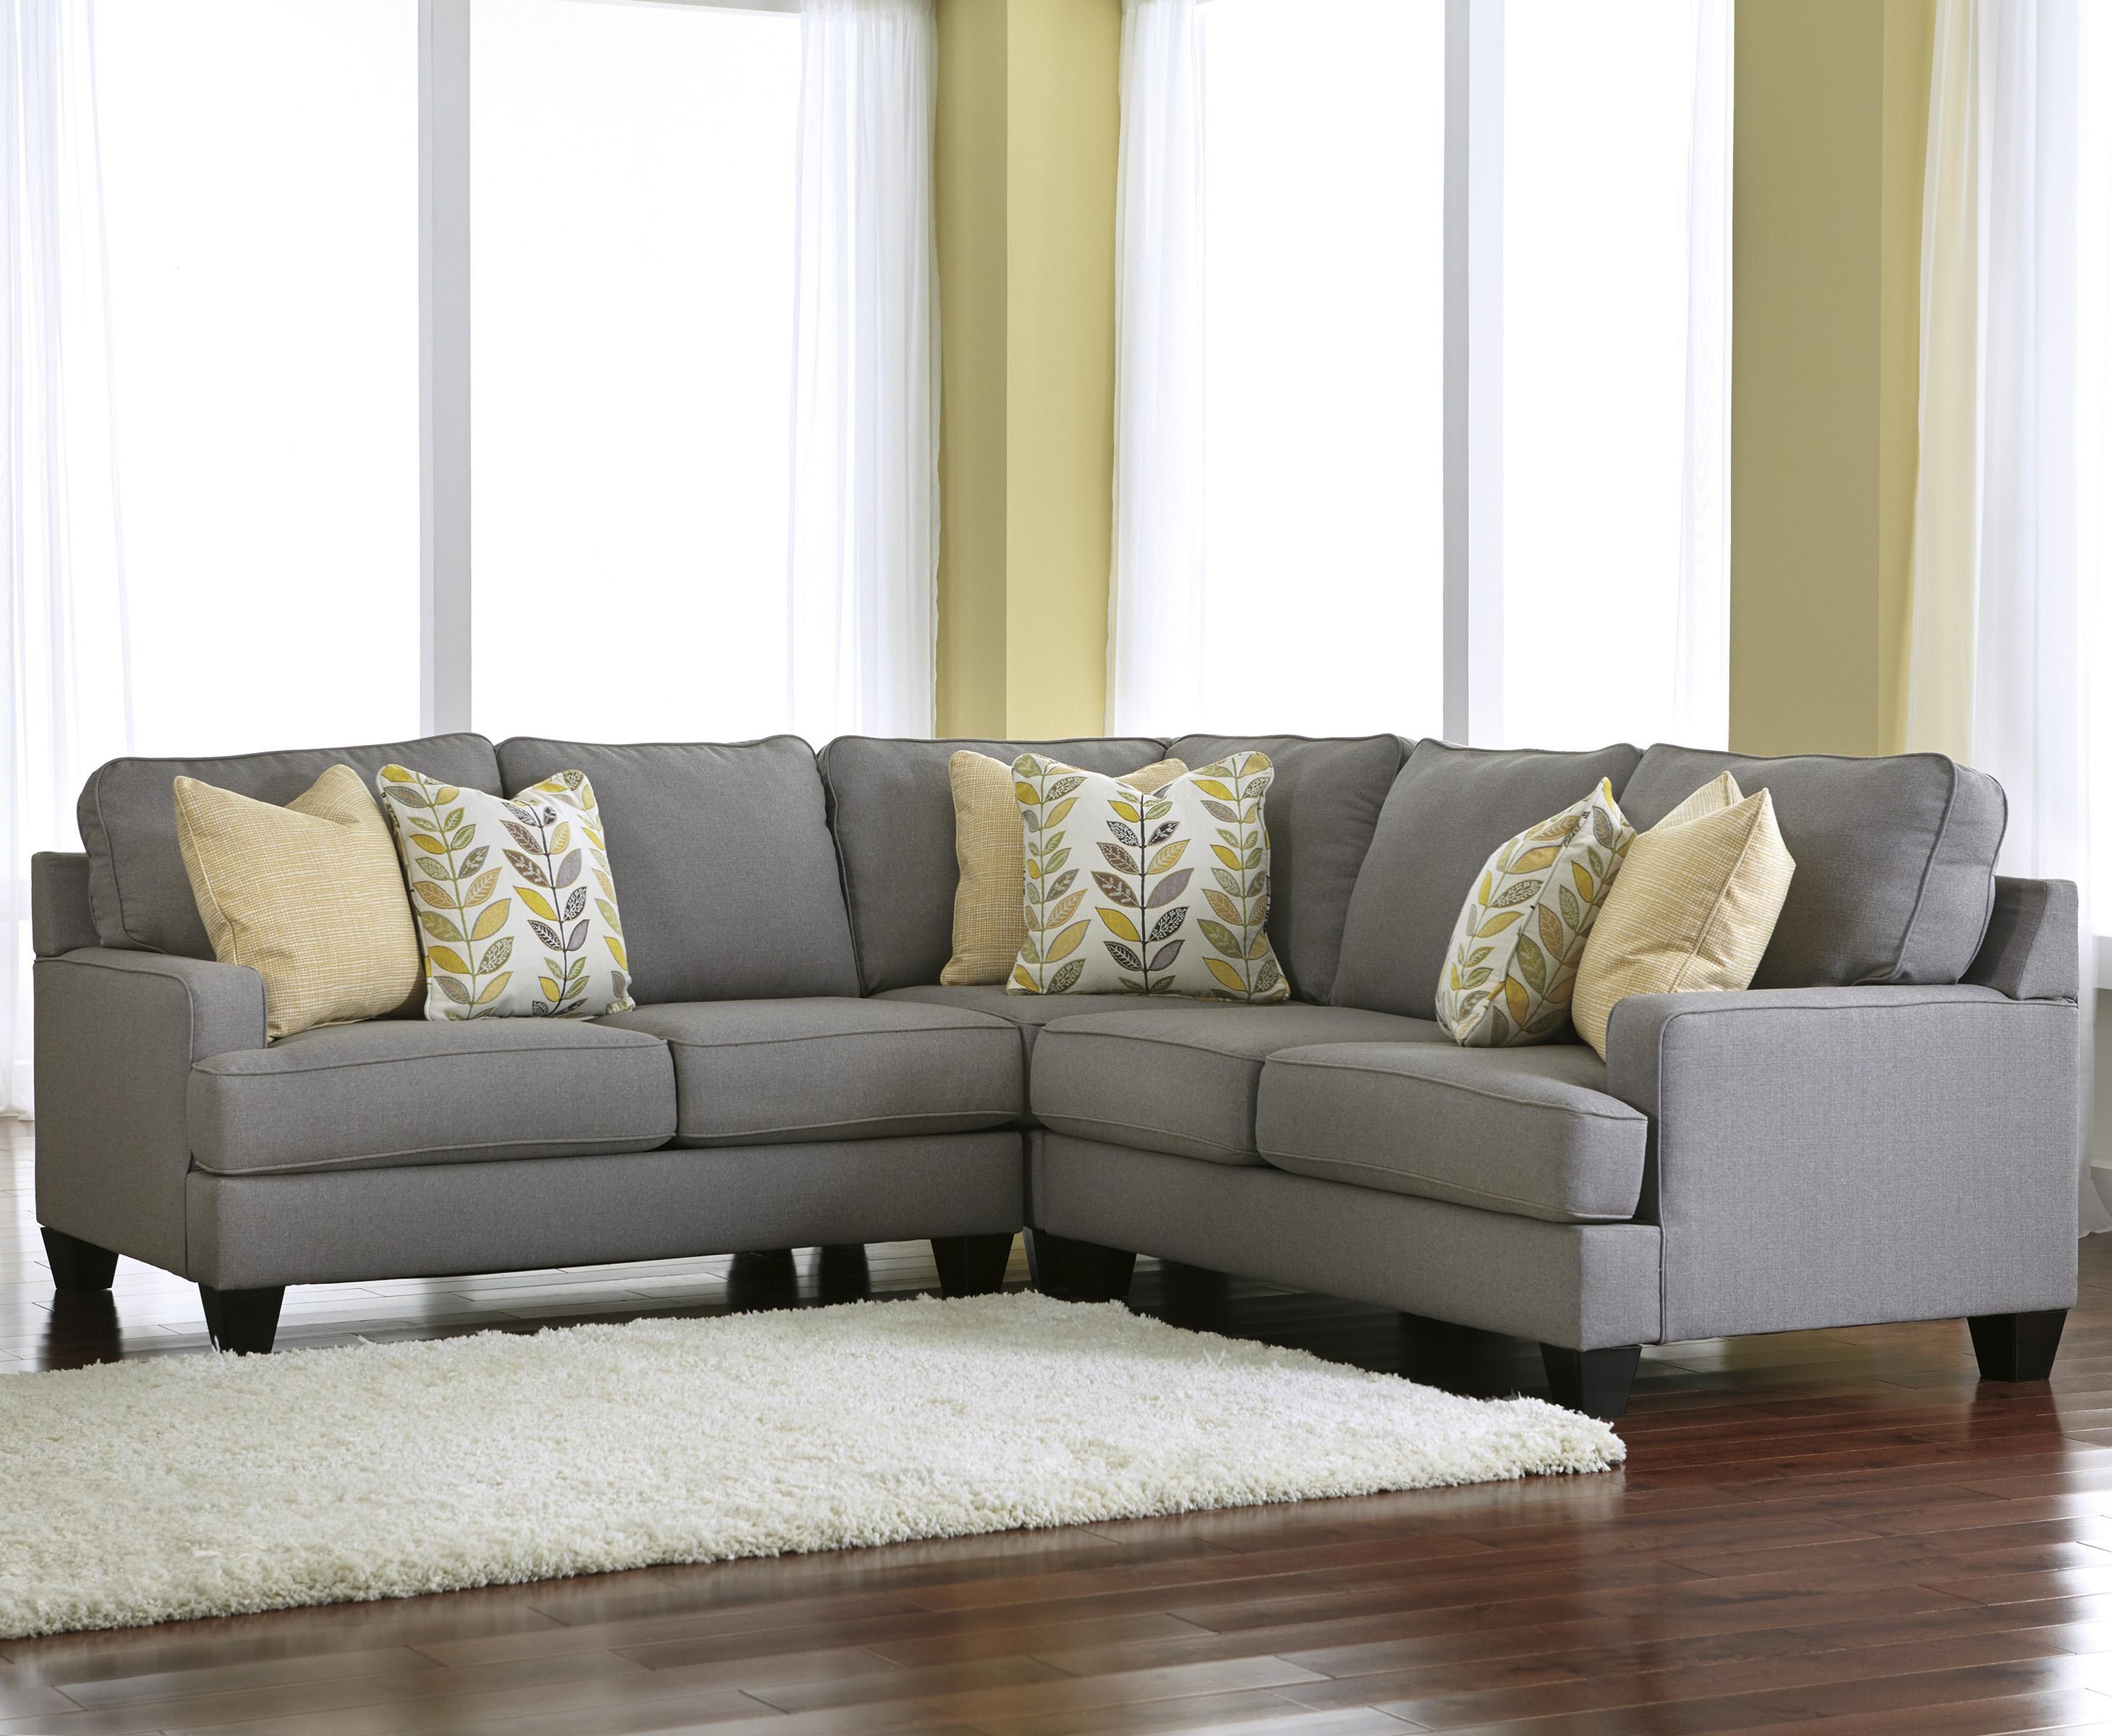 3-Piece Corner Sectional Sofa